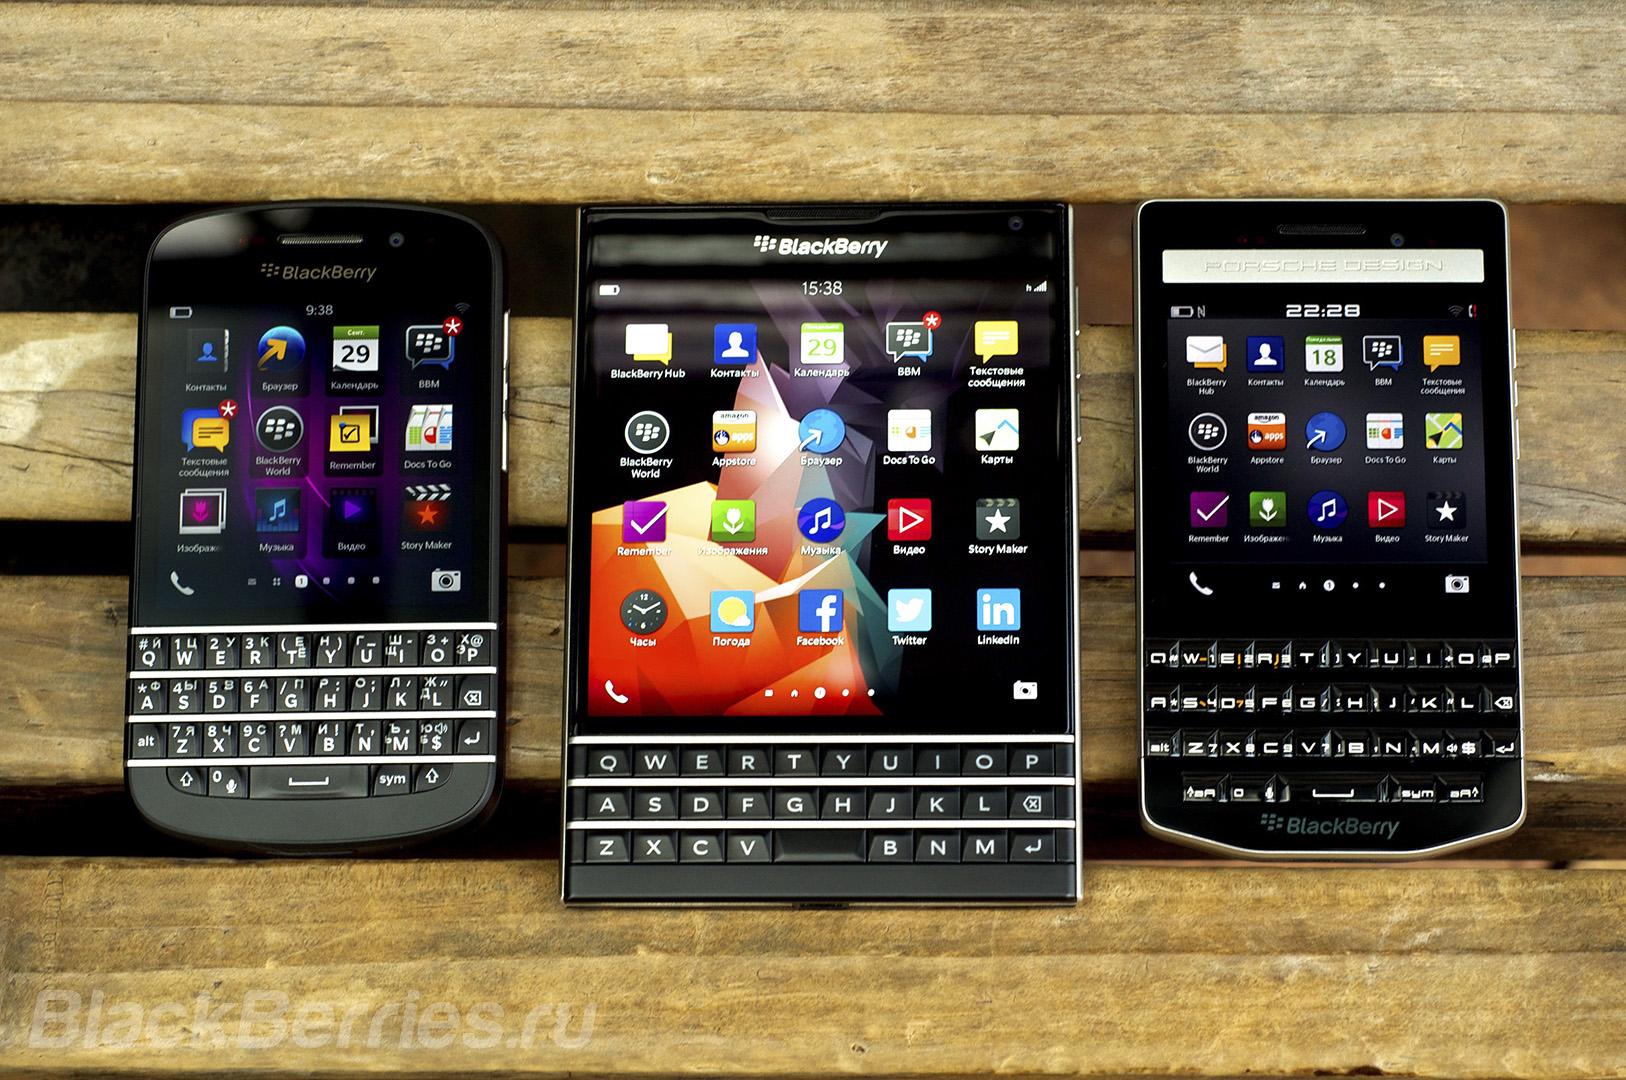 BlackBerry-Passport-Review-2014-14